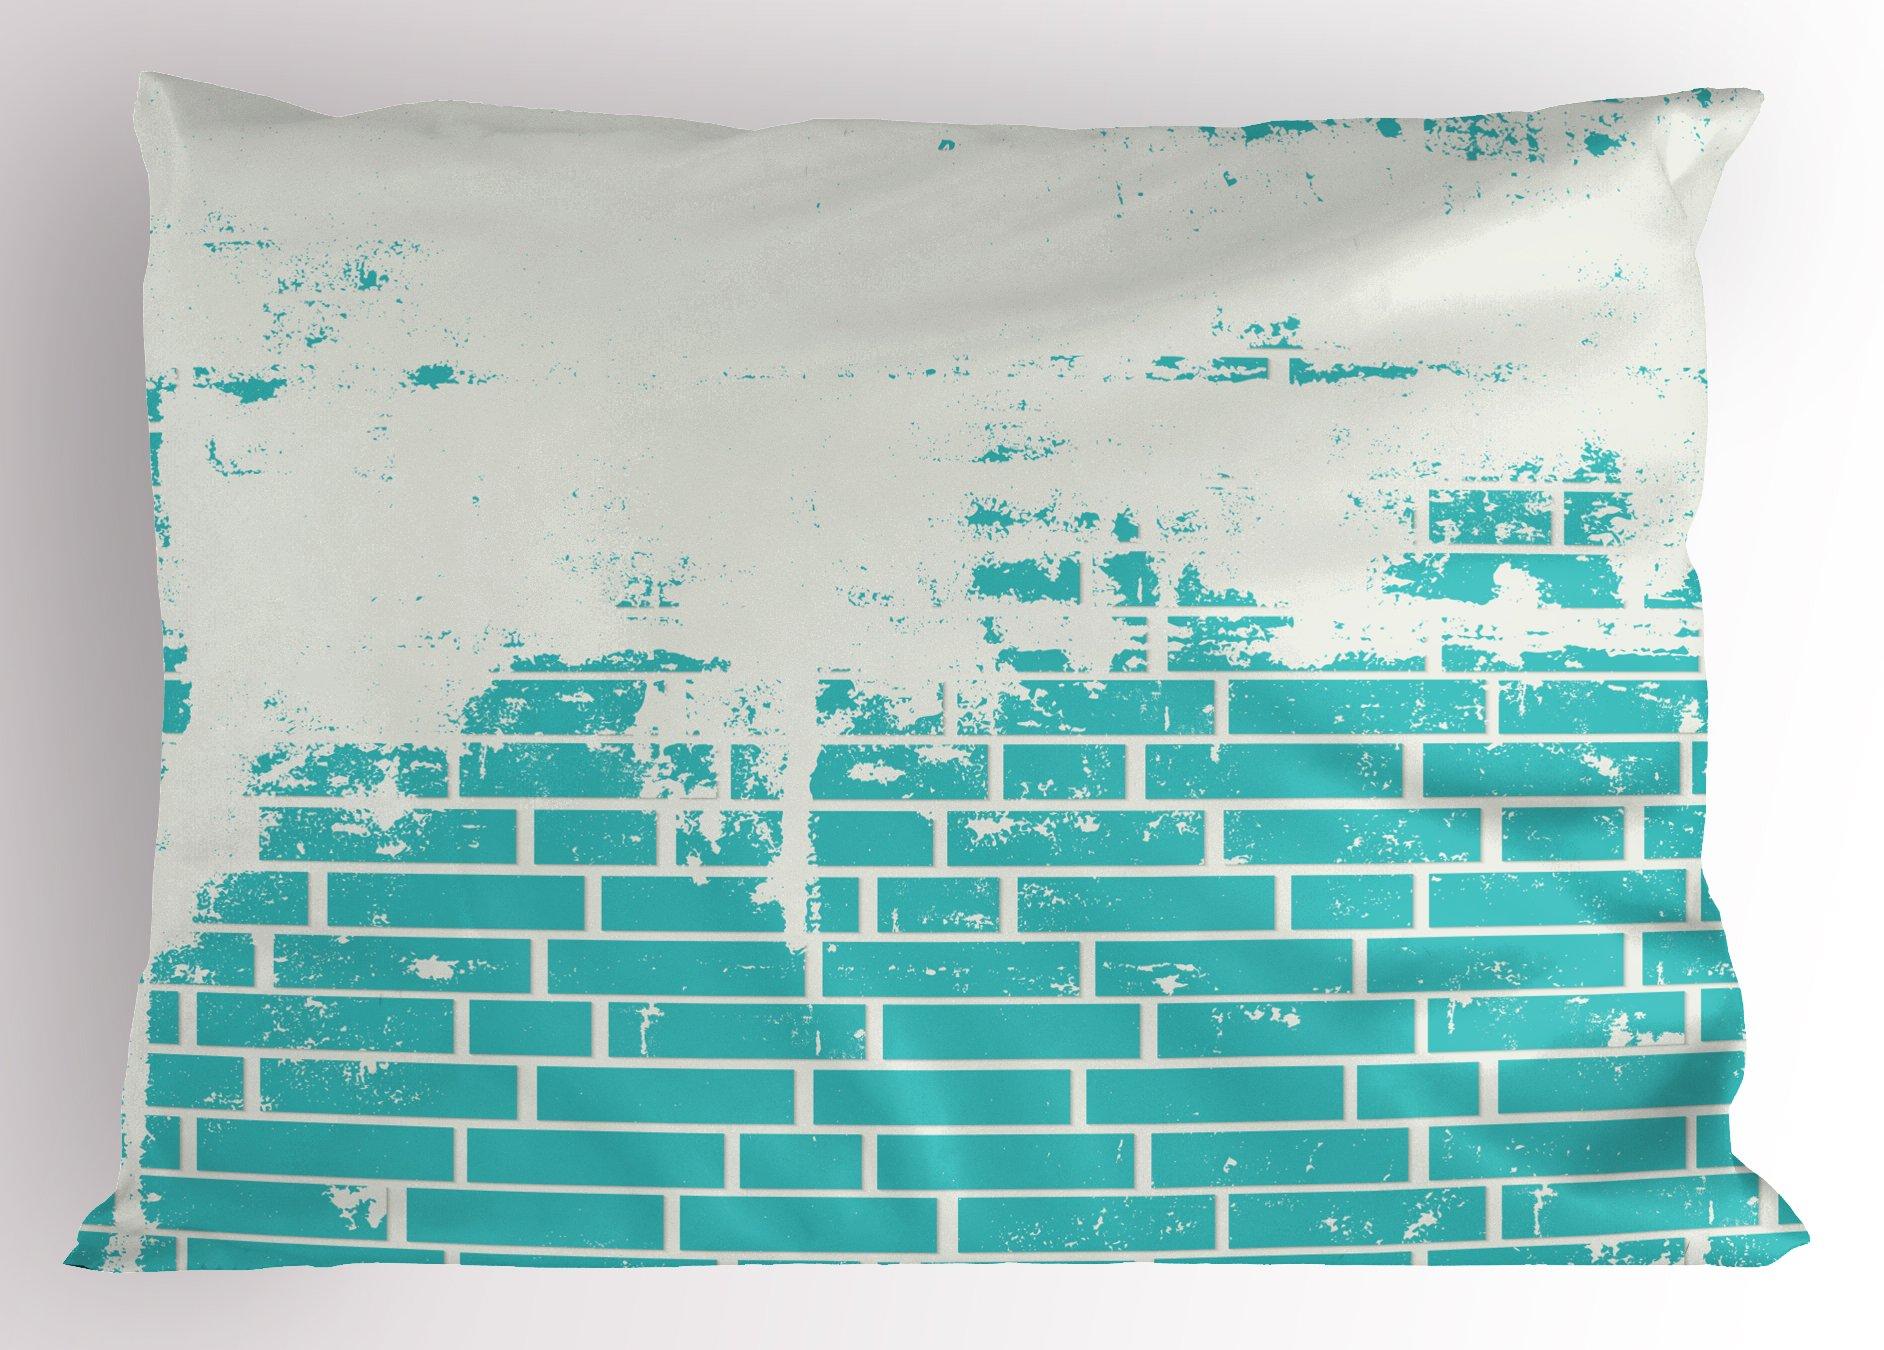 Lunarable Turquoise Pillow Sham, Plastered Brick Wall Aged Masonry Vintage Construction Stylized Modern Art Print, Decorative Standard Size Printed Pillowcase, 26 X 20 inches, Blue White